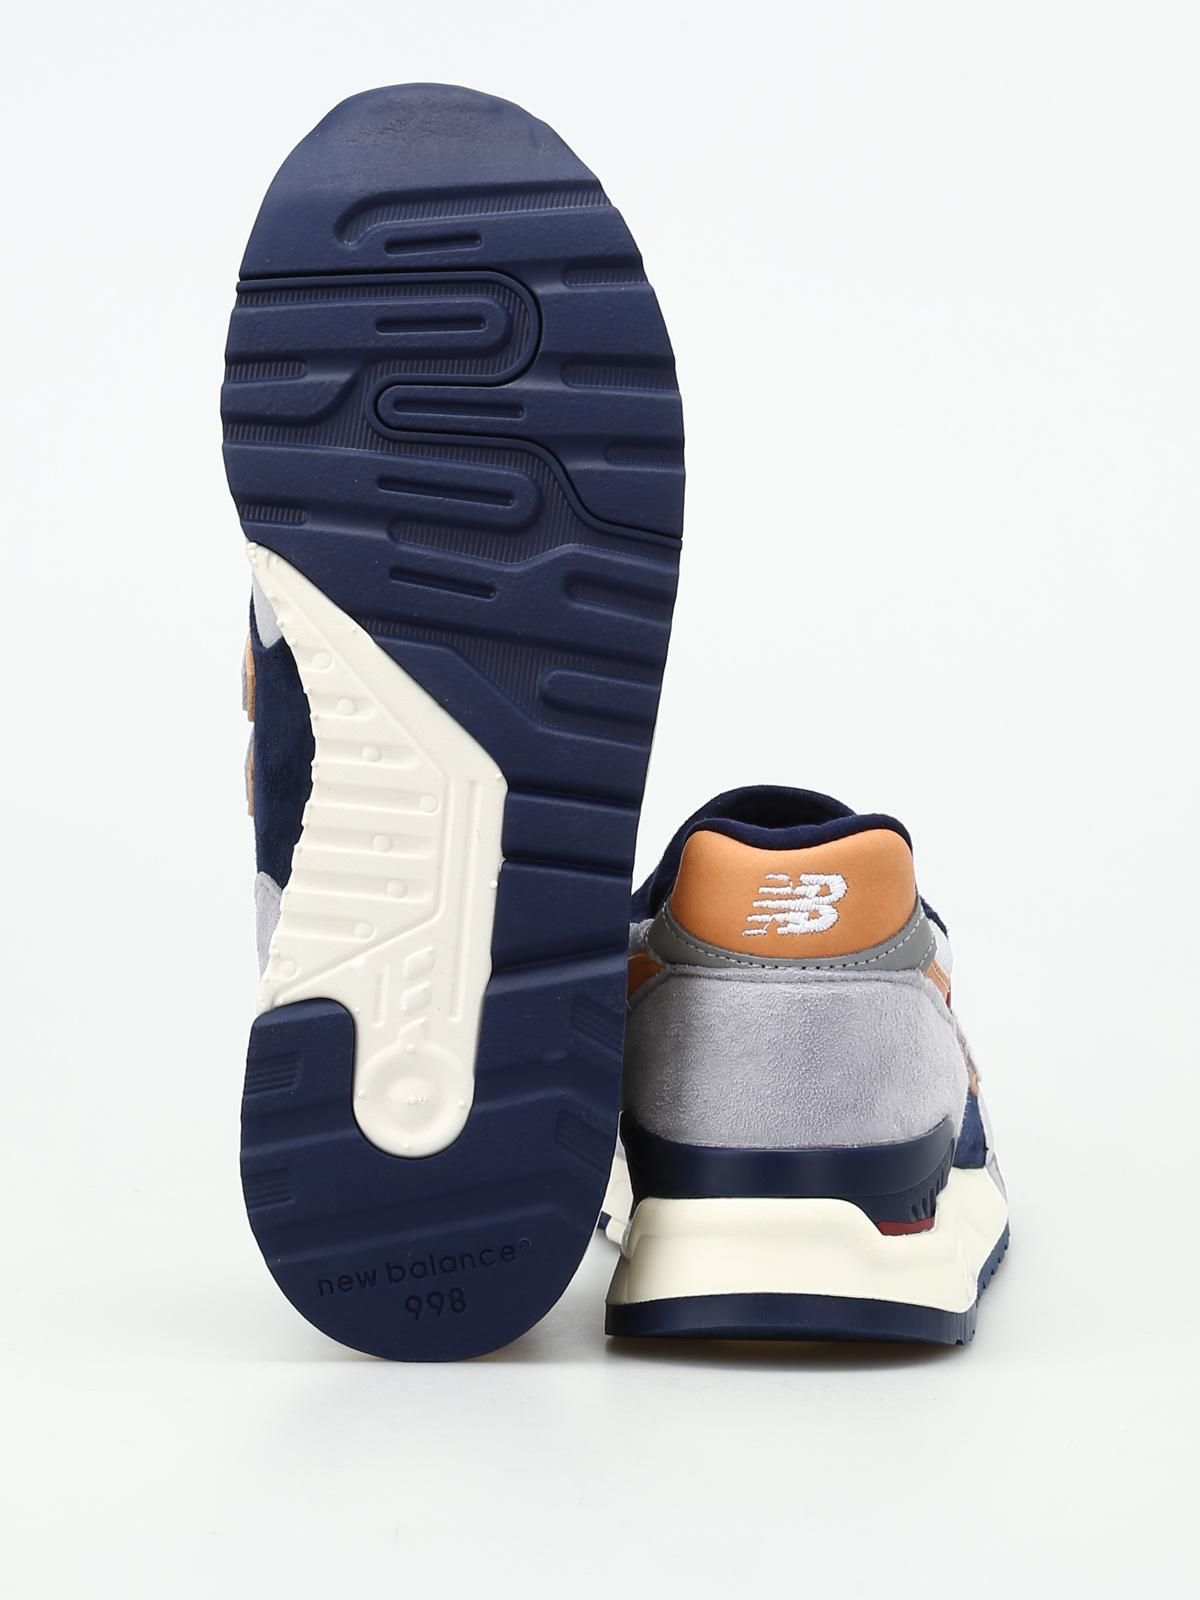 reputable site dce0e bdc00 New Balance - 998 Desert Heat sneakers - trainers - M998CSU ...